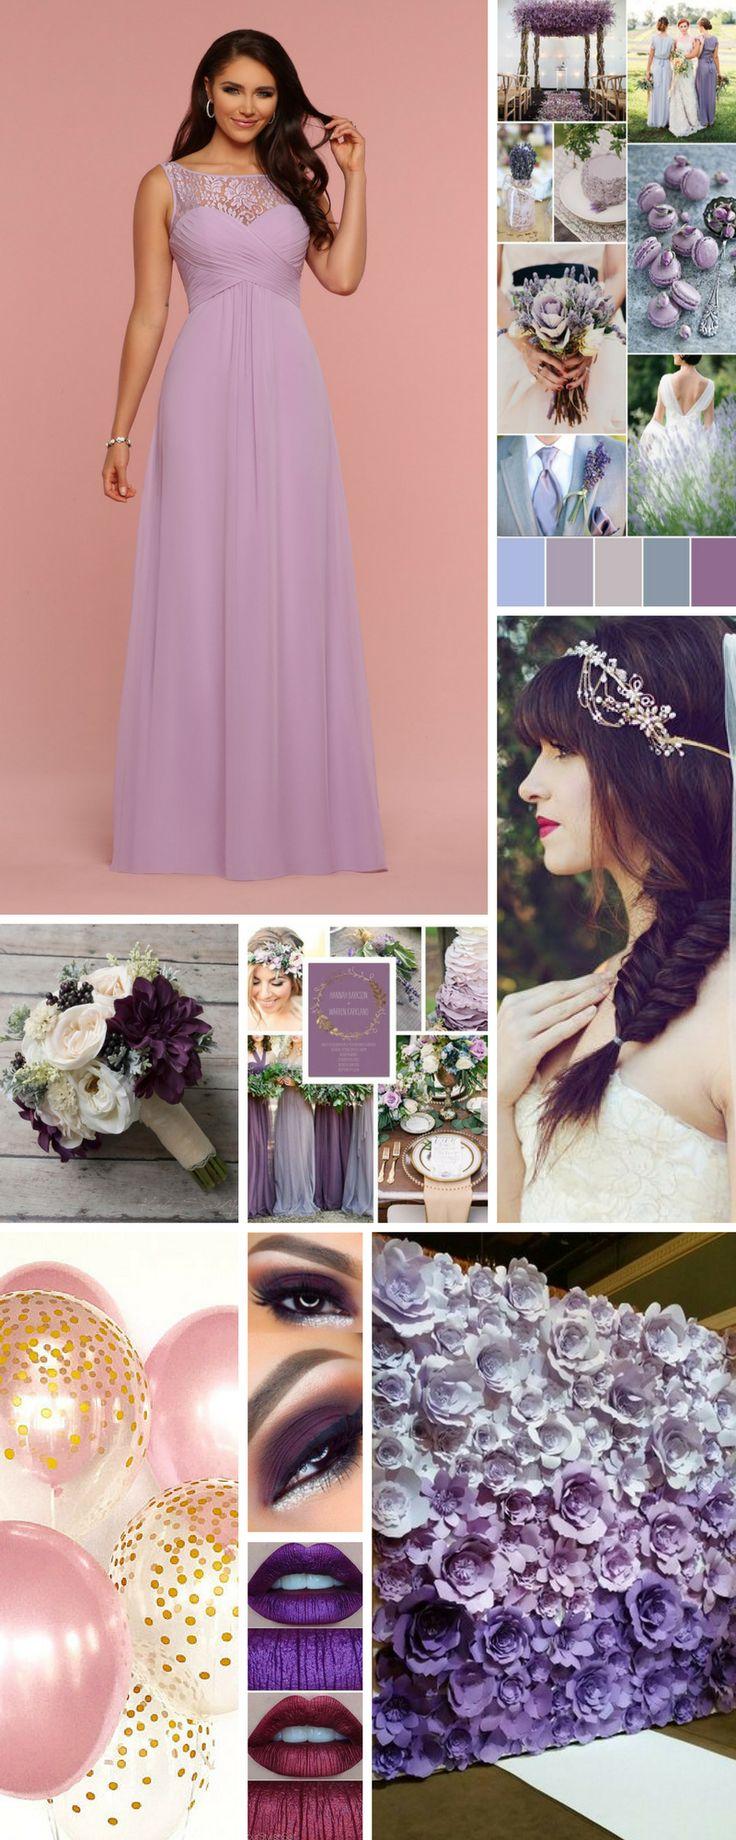 Mejores 309 imágenes de DaVinci Bridesmaids en Pinterest